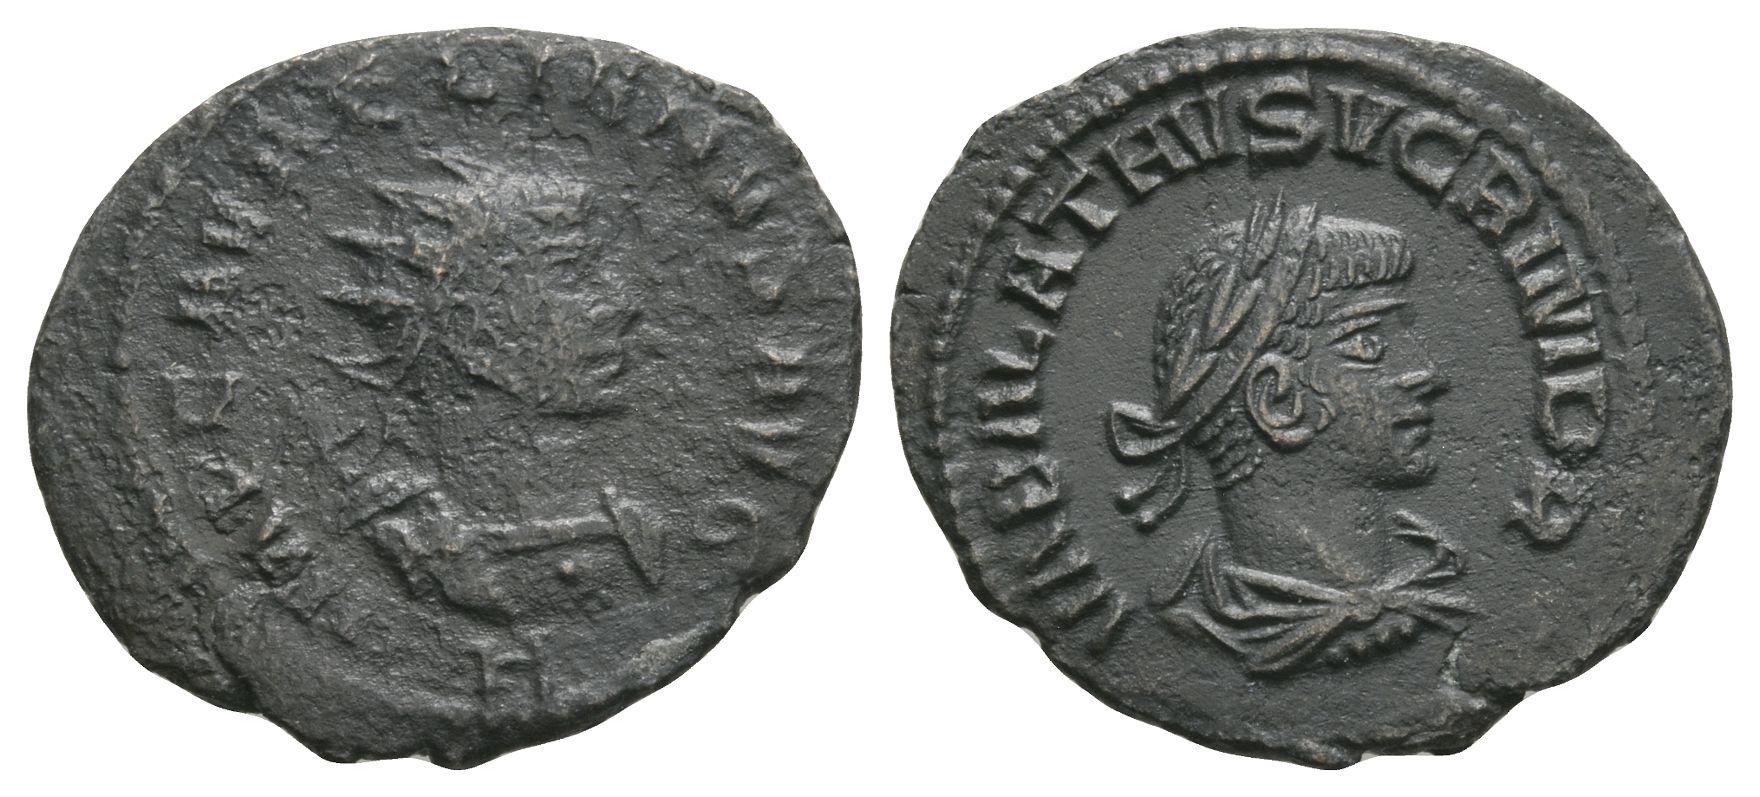 Roman Imperial Coins - Vabalathus and Aurelian - Double Portrait Antoninianus